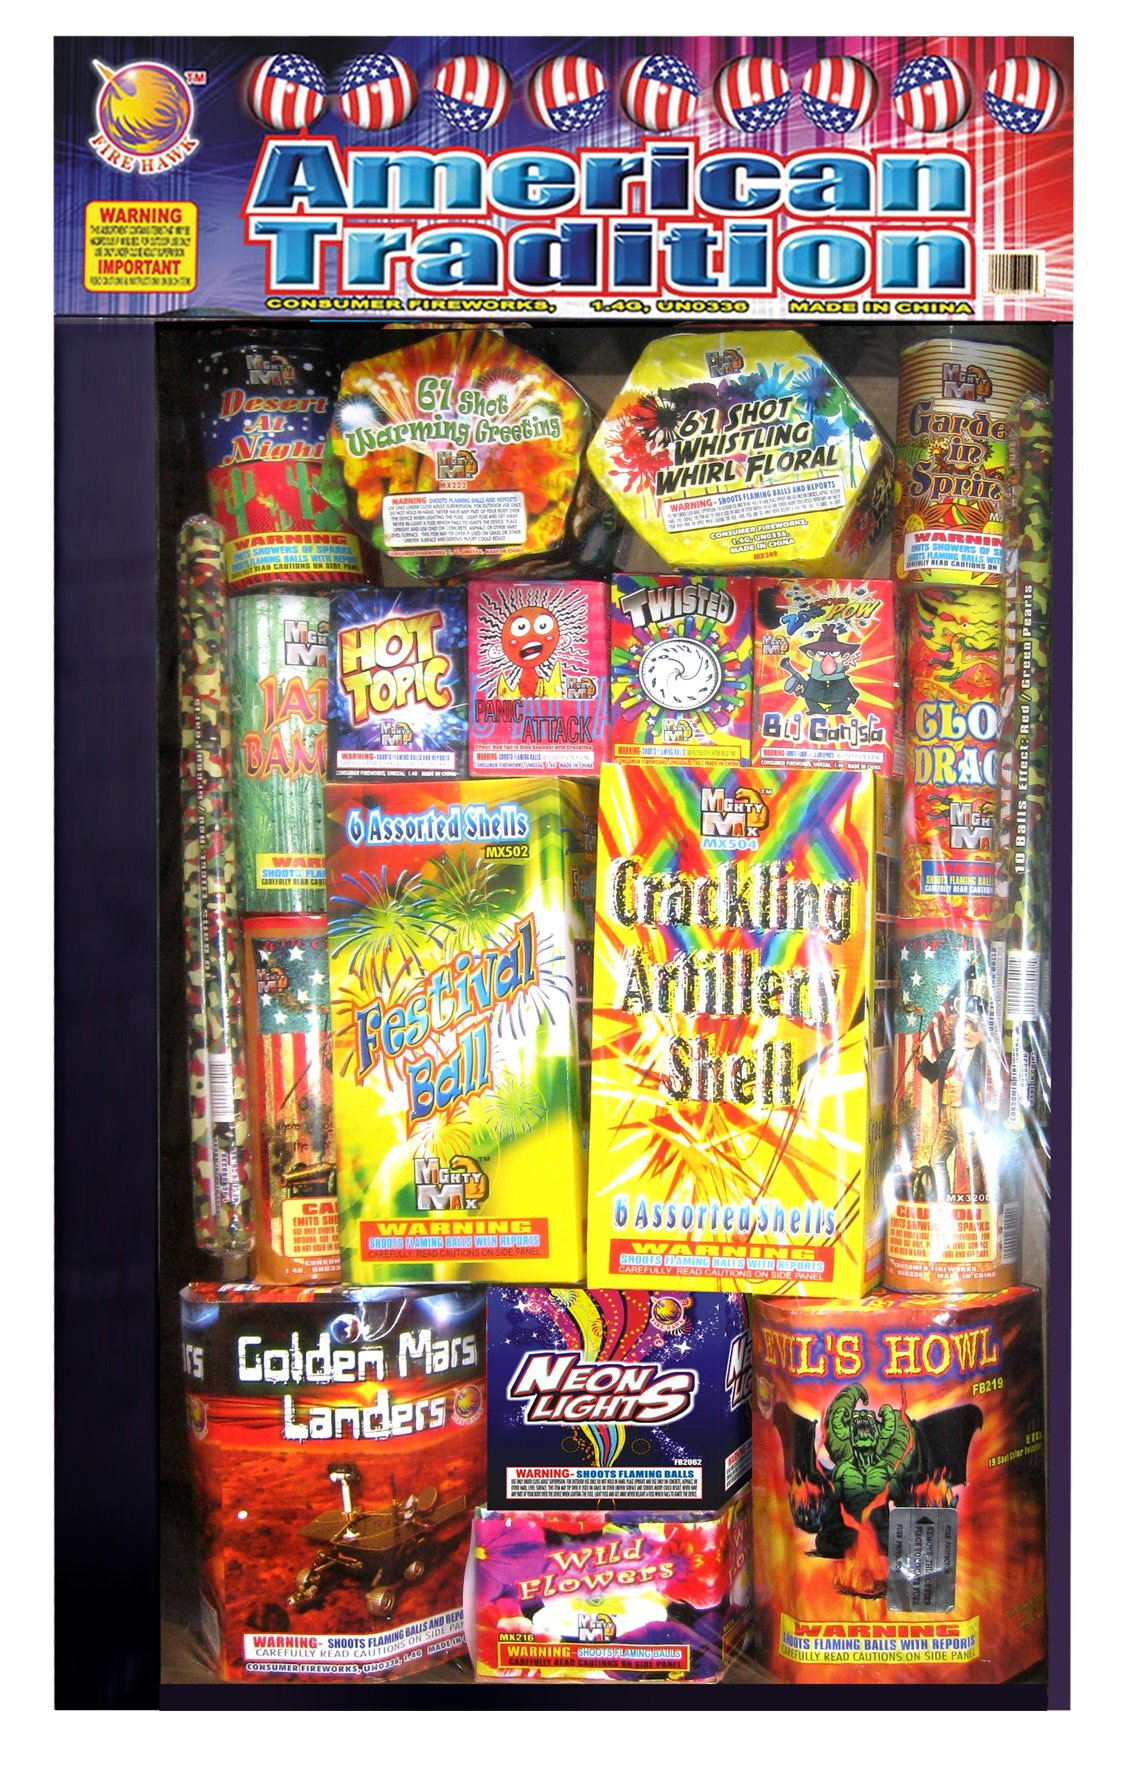 Fireworks Training Course   KCs Fireworks Displays